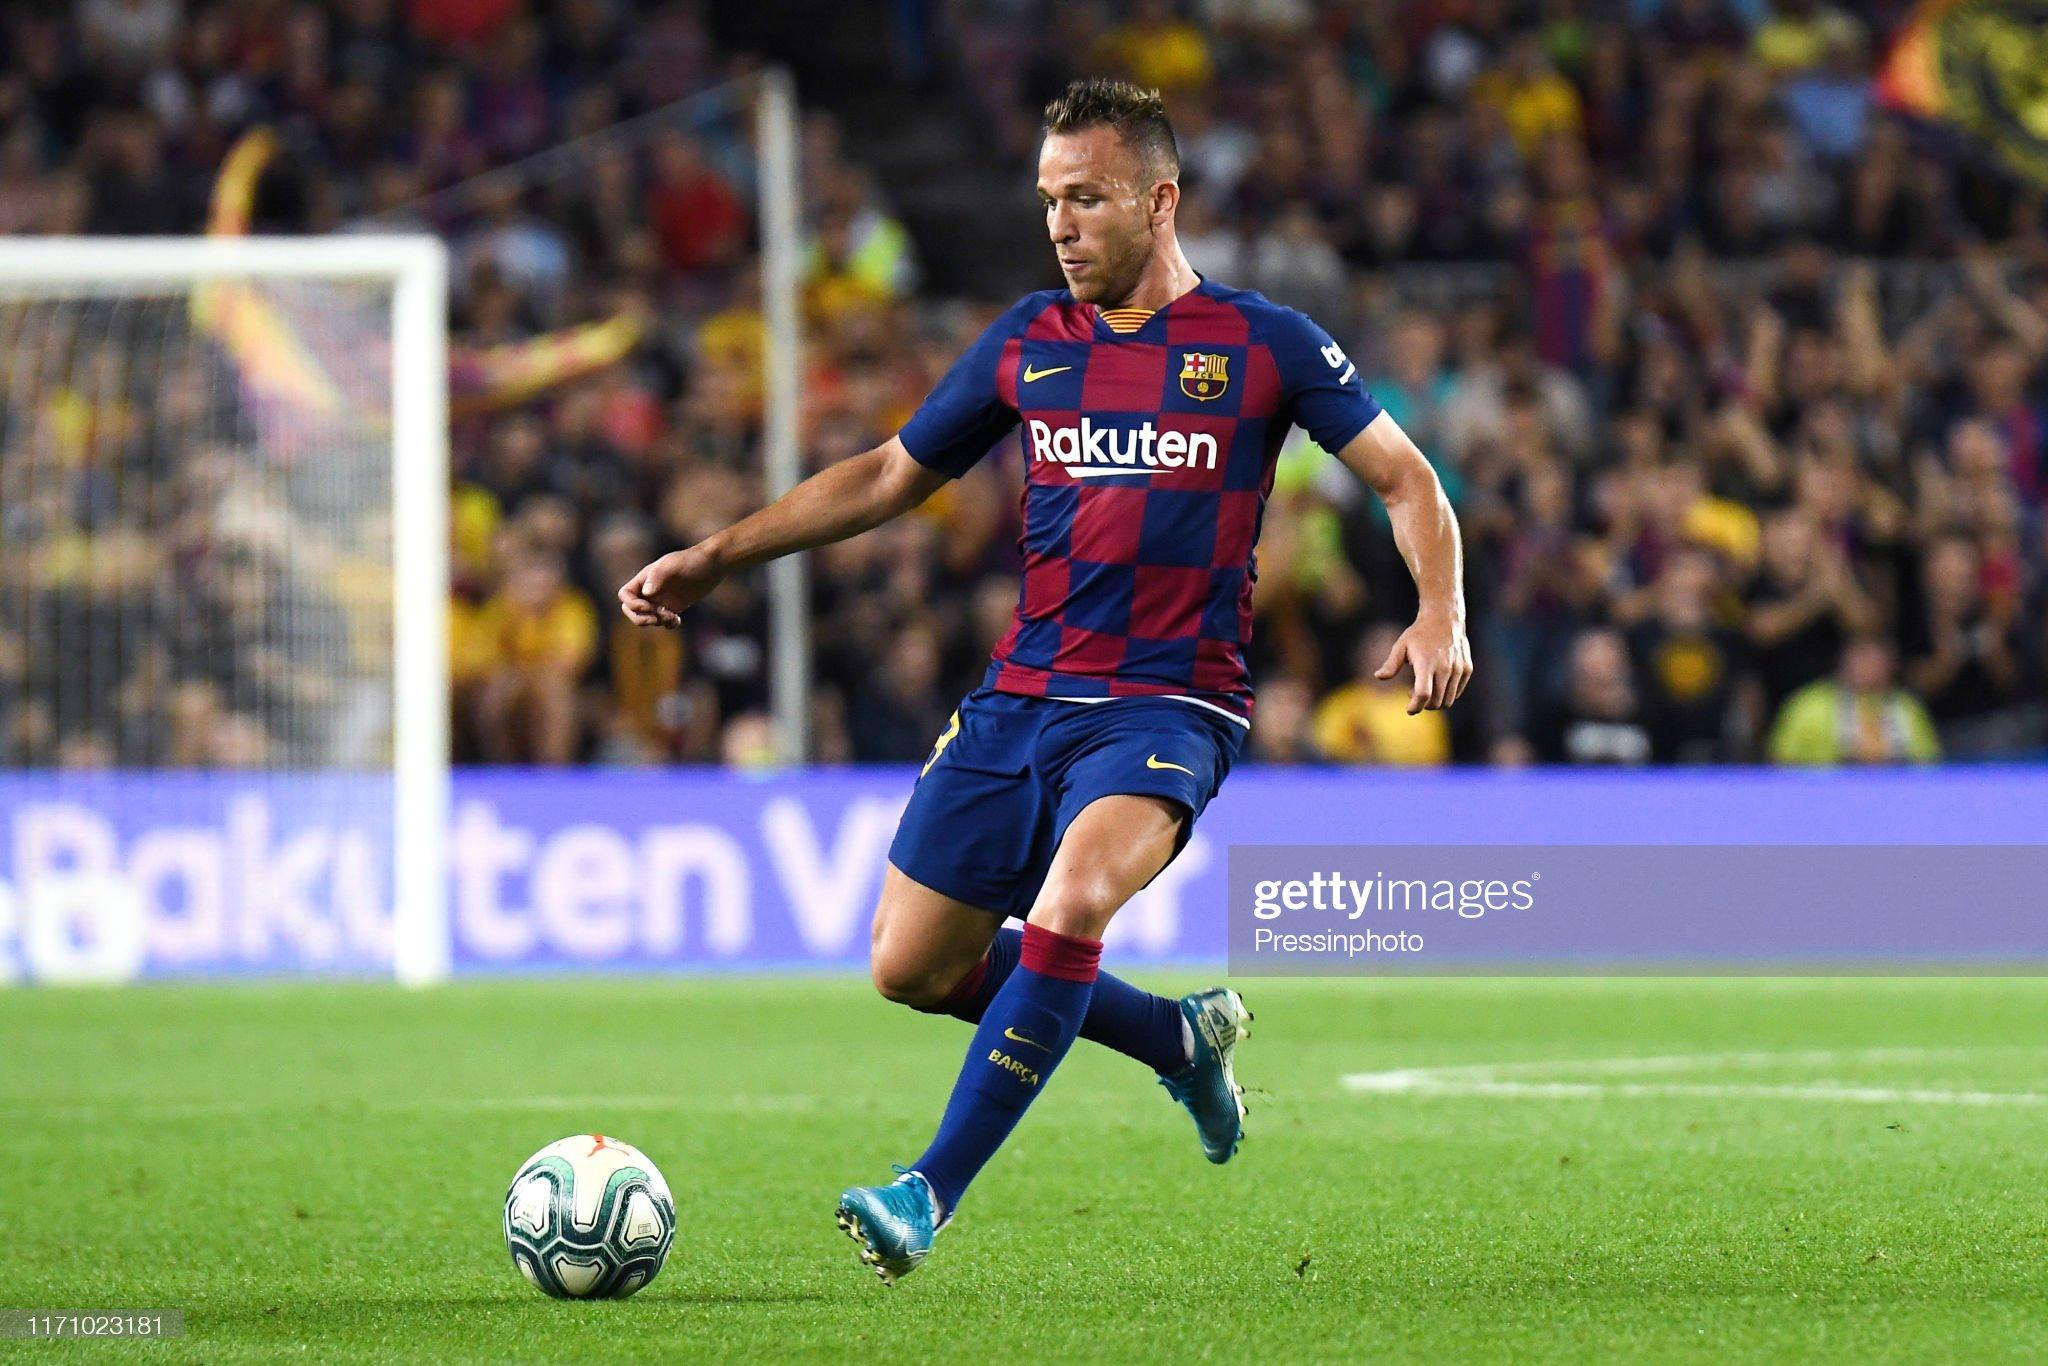 صور مباراة : برشلونة - فياريال 2-1 ( 24-09-2019 )  Arthur-melo-of-fc-barcelona-during-the-liga-match-between-barcelona-picture-id1171023181?s=2048x2048